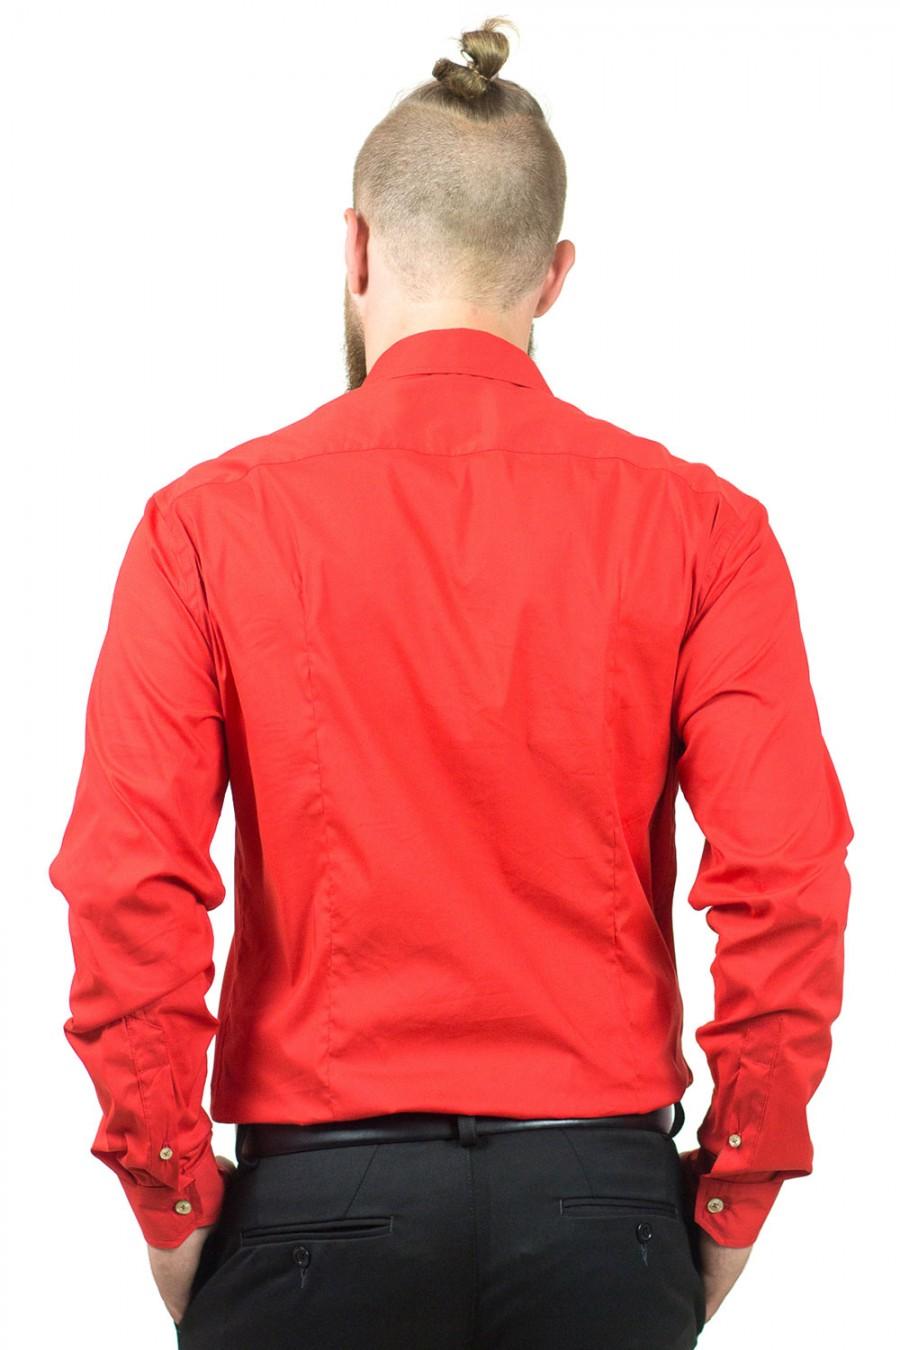 Мужская рубашка S-119-9